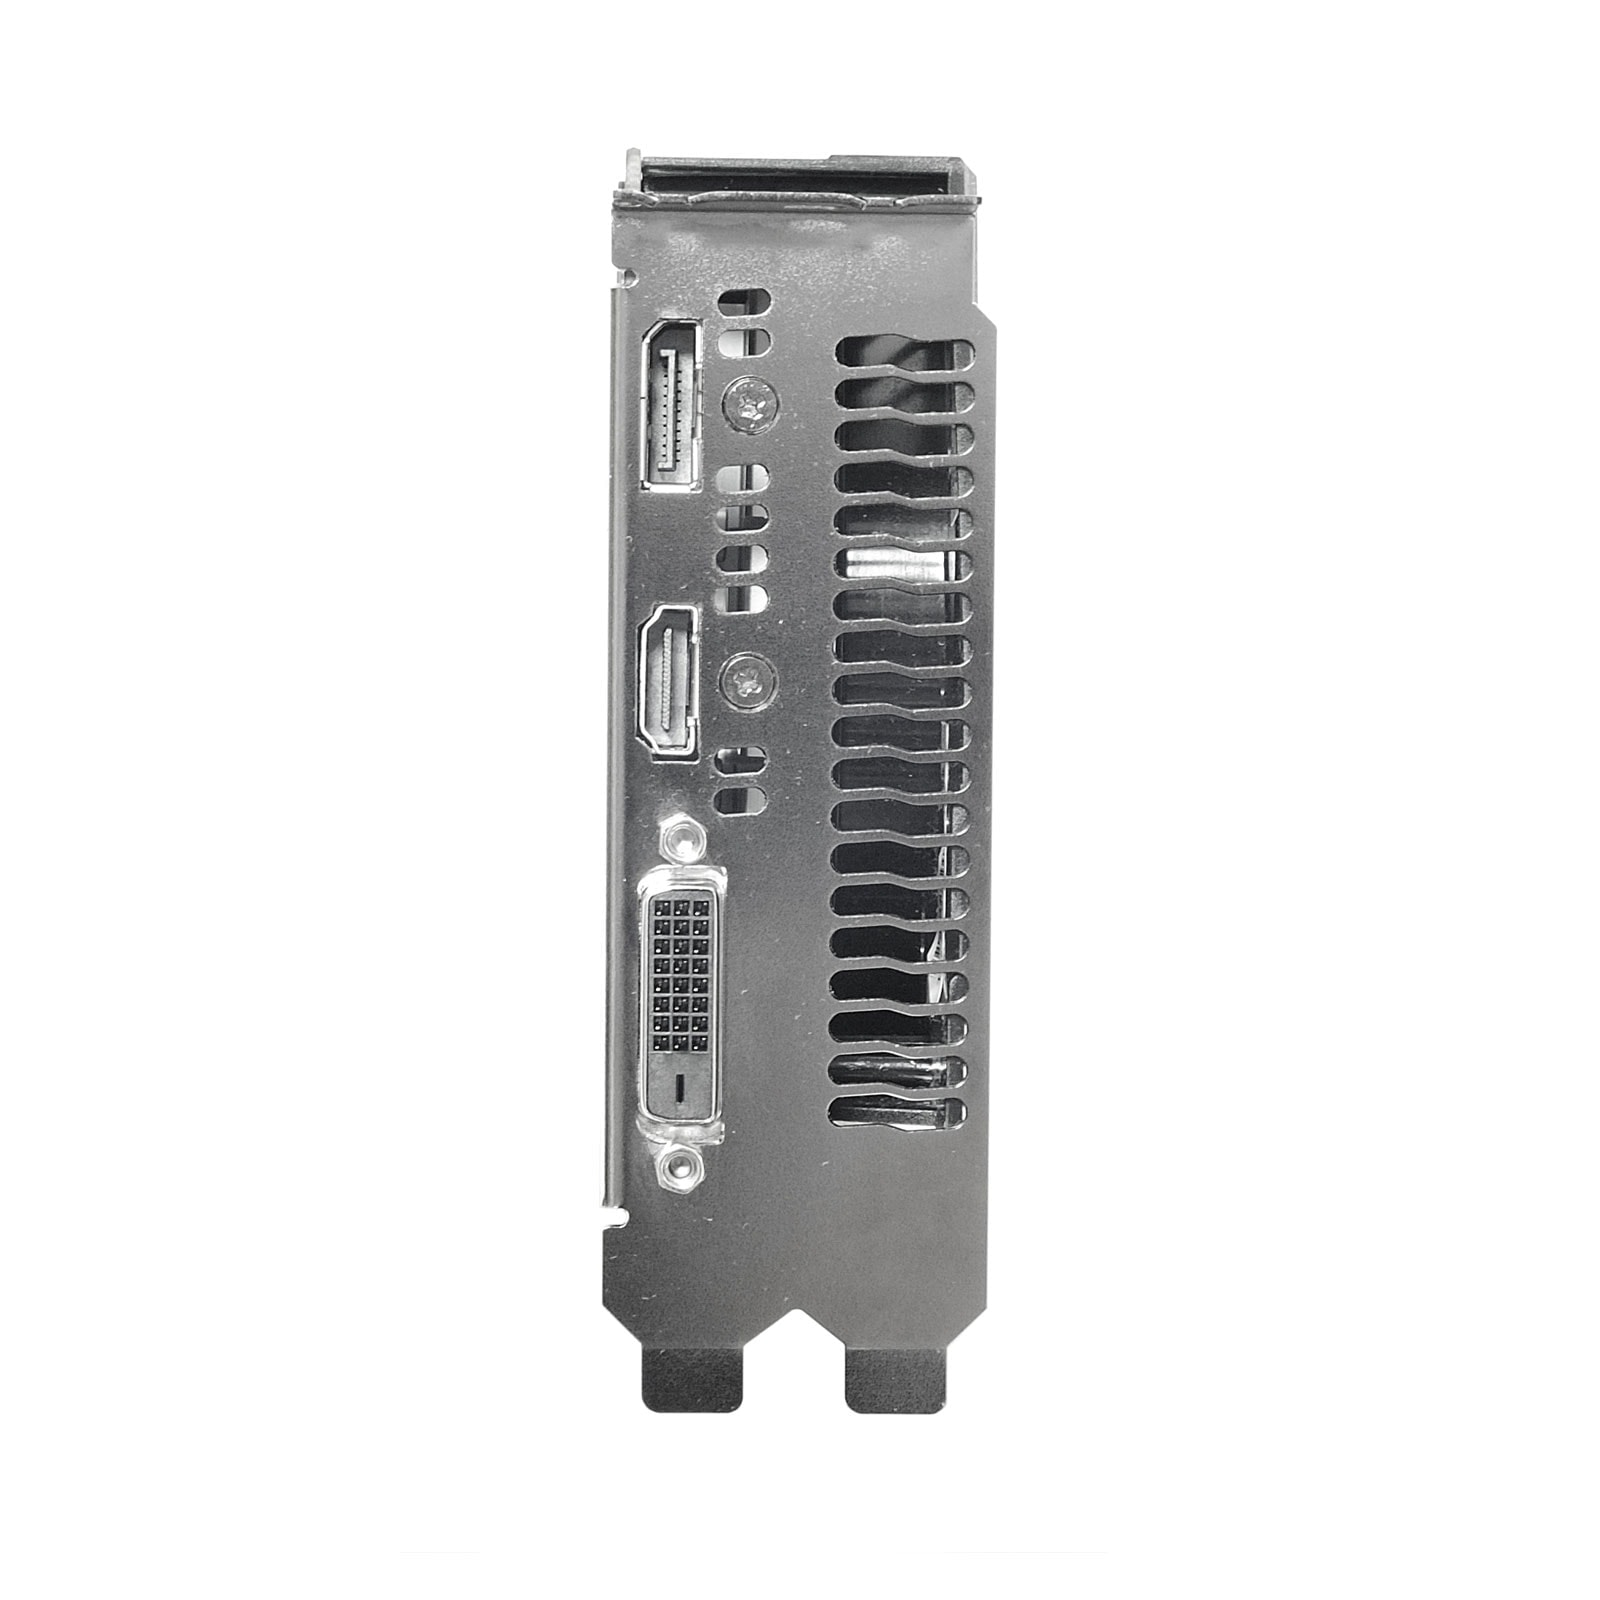 Asus EX-GTX1050TI-4G 4Go - Carte graphique Asus - Cybertek.fr - 3